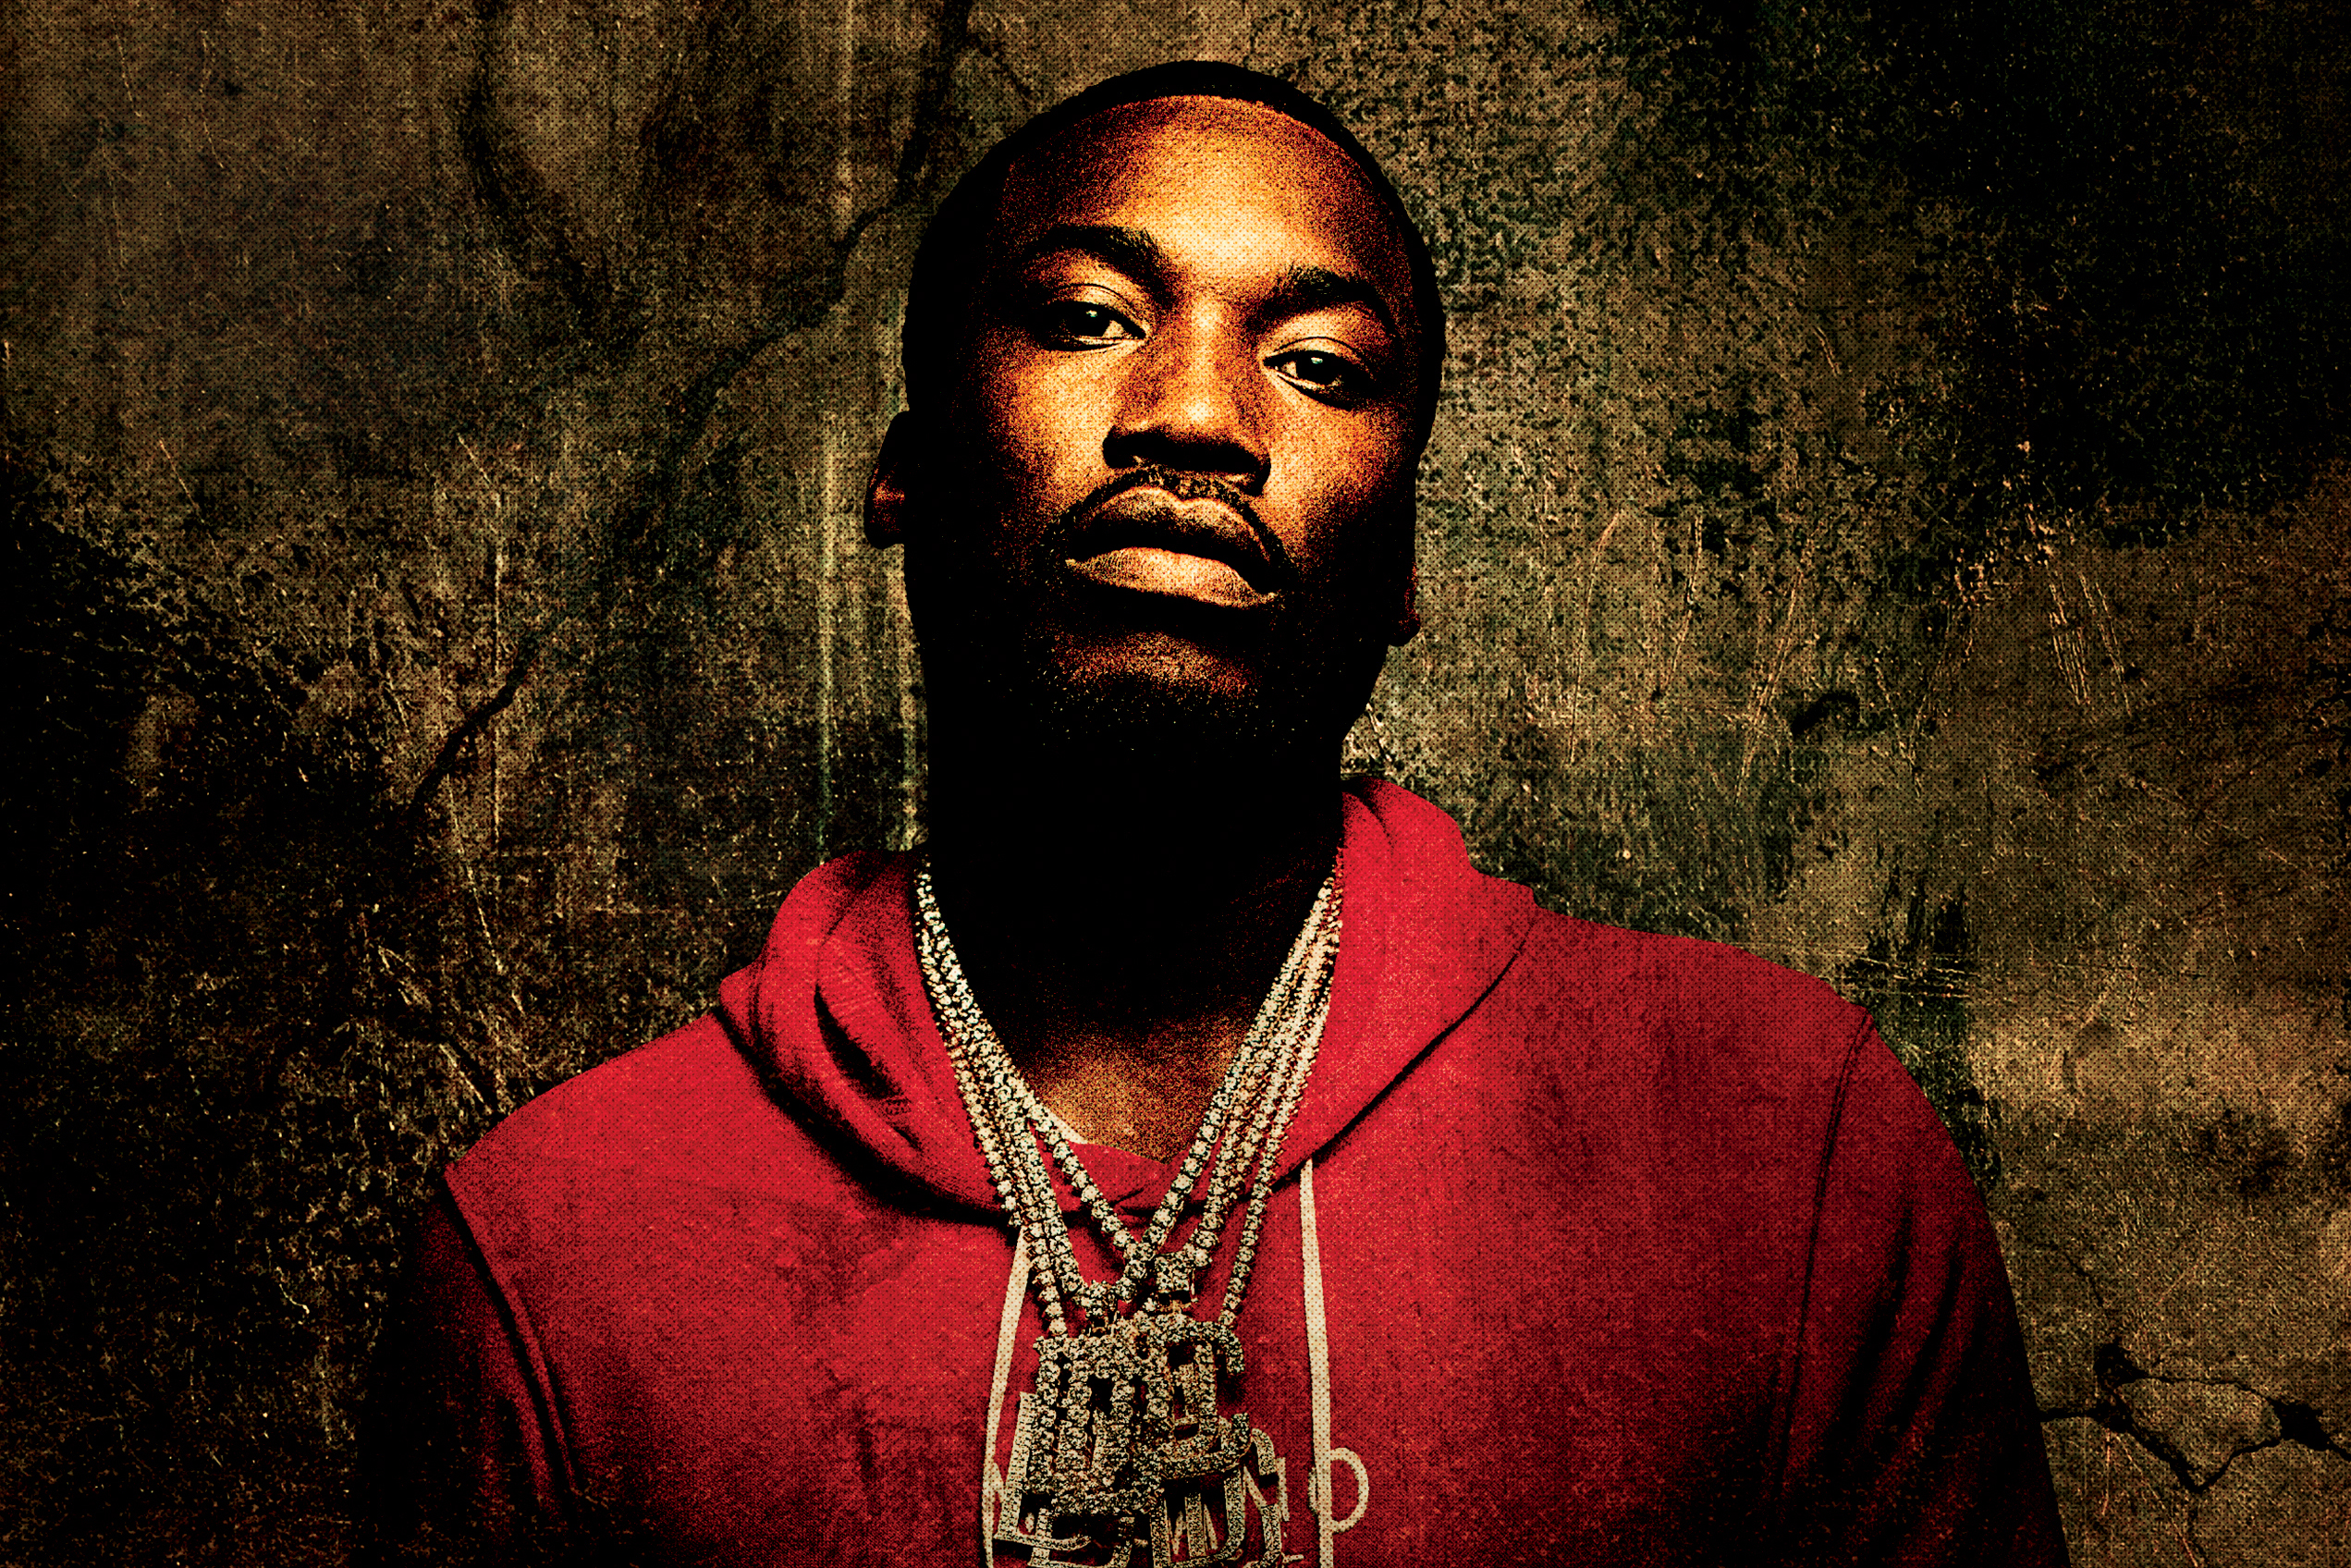 Freemeekmill Rapper Meek Mill Exclusive Interview From Prison